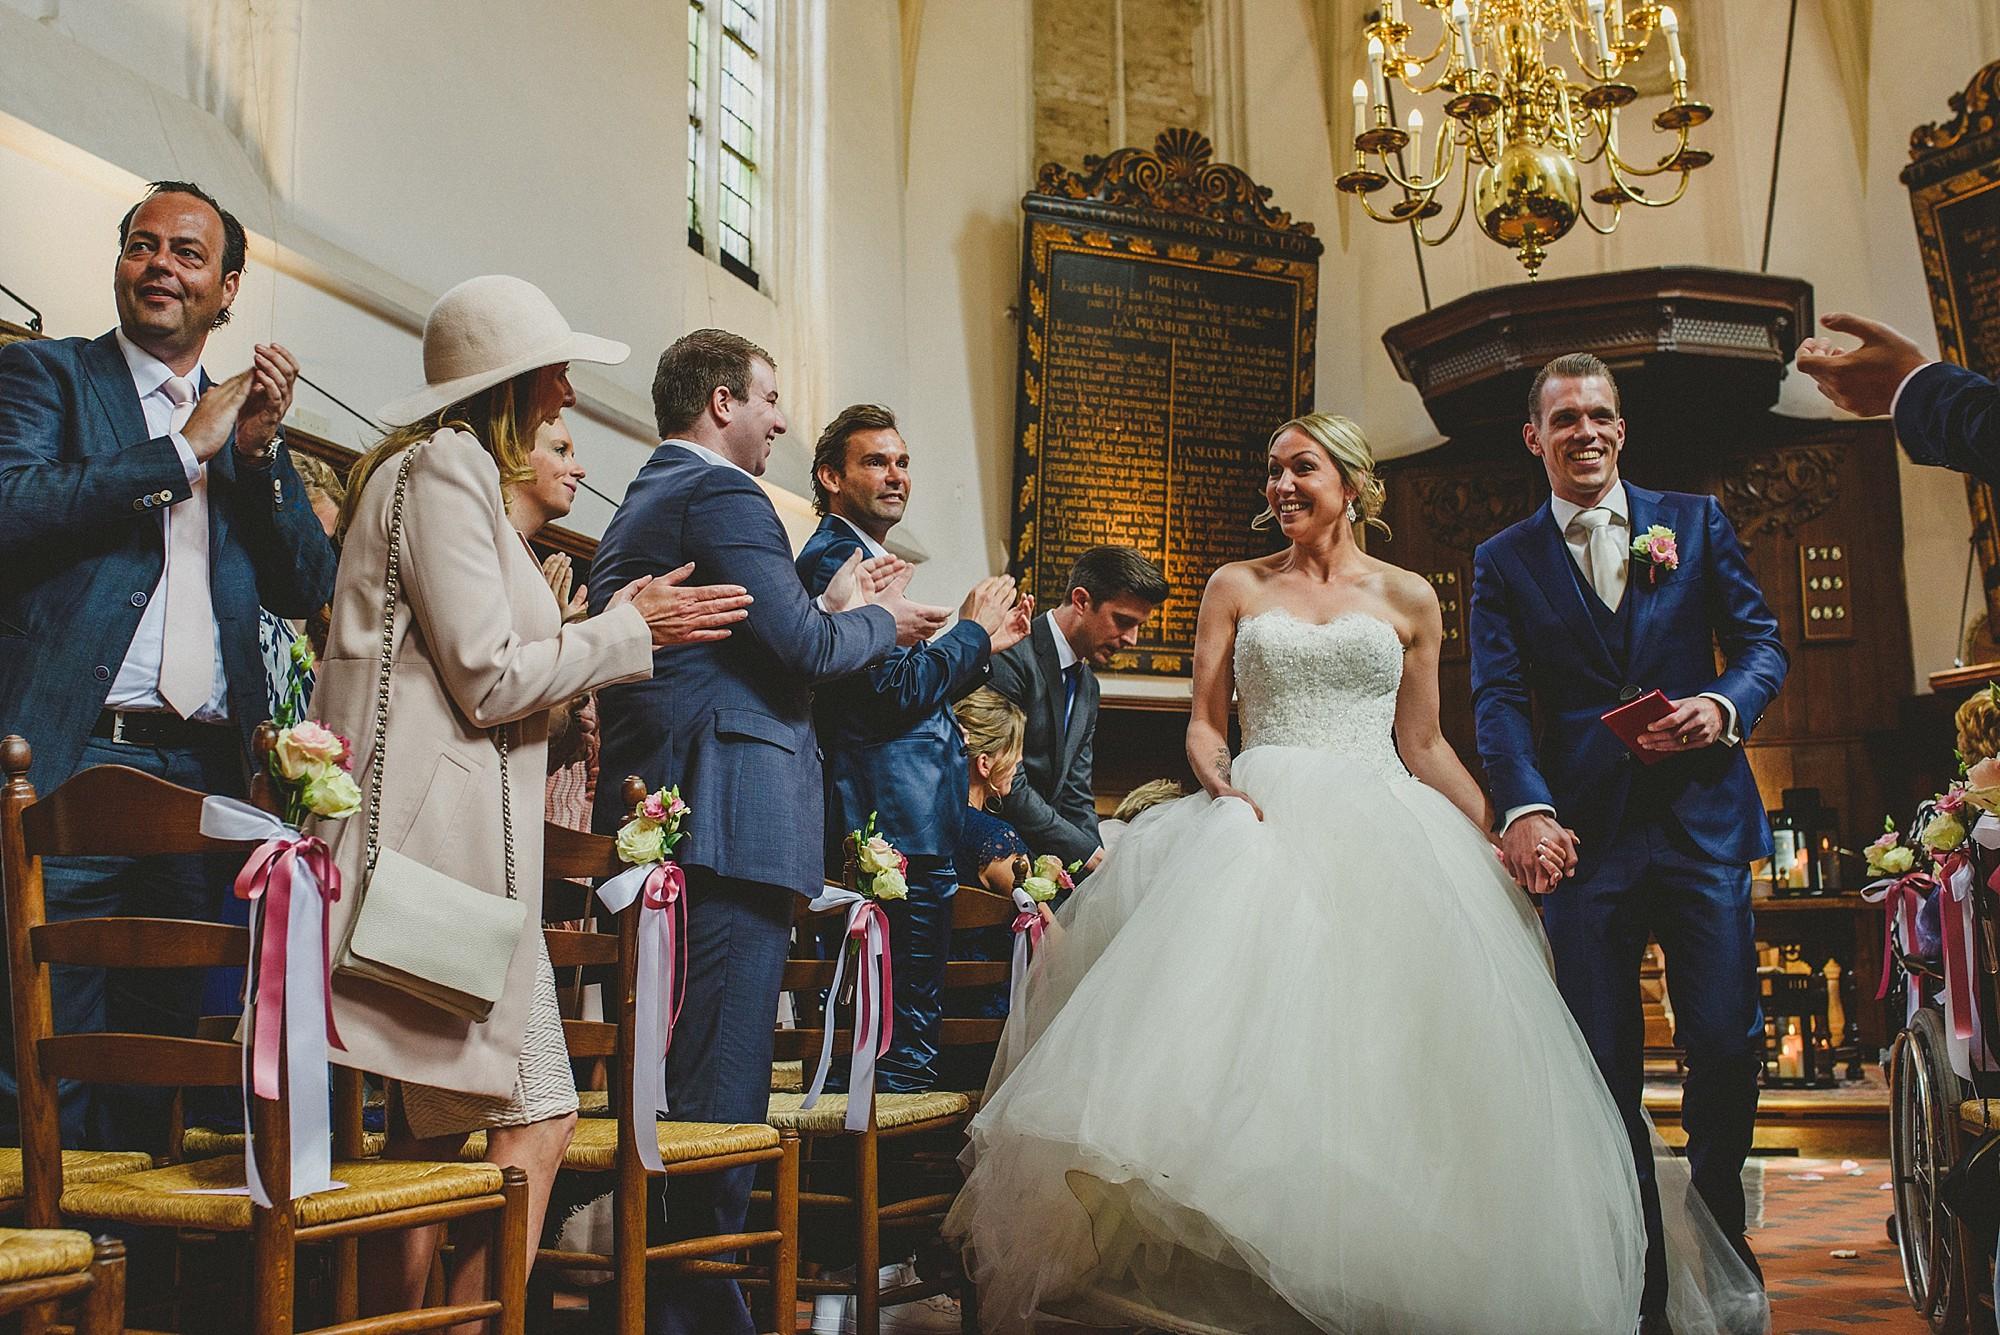 beste trouwfotograaf van nederland (49 van 69).jpg